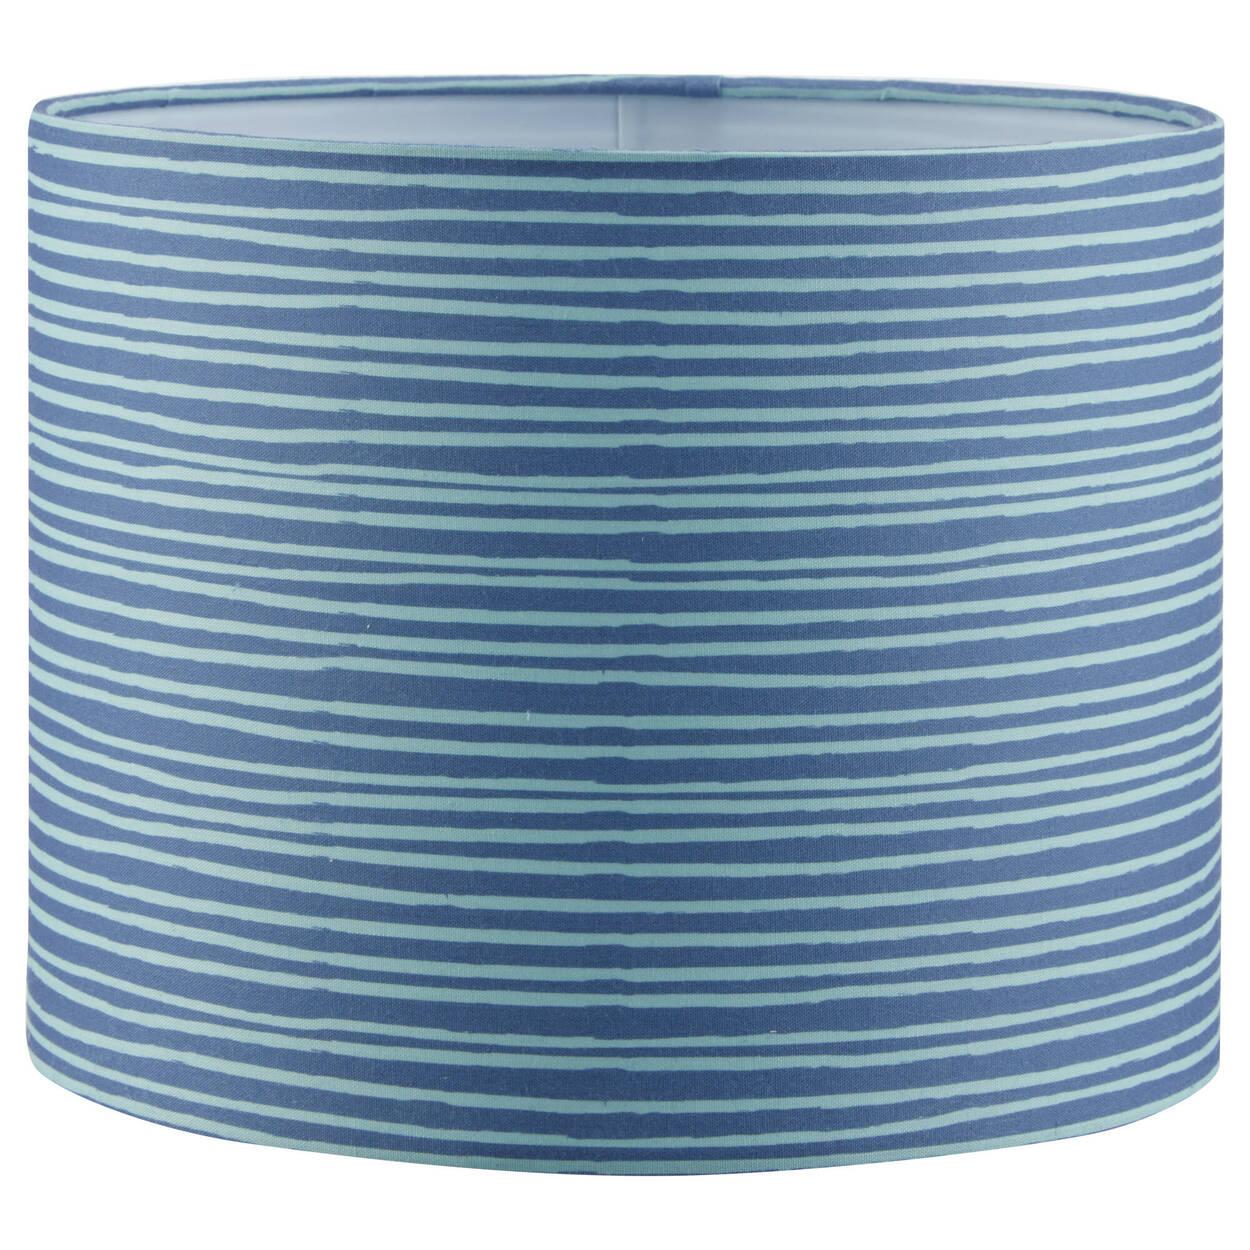 Round Striped Lamp Shade